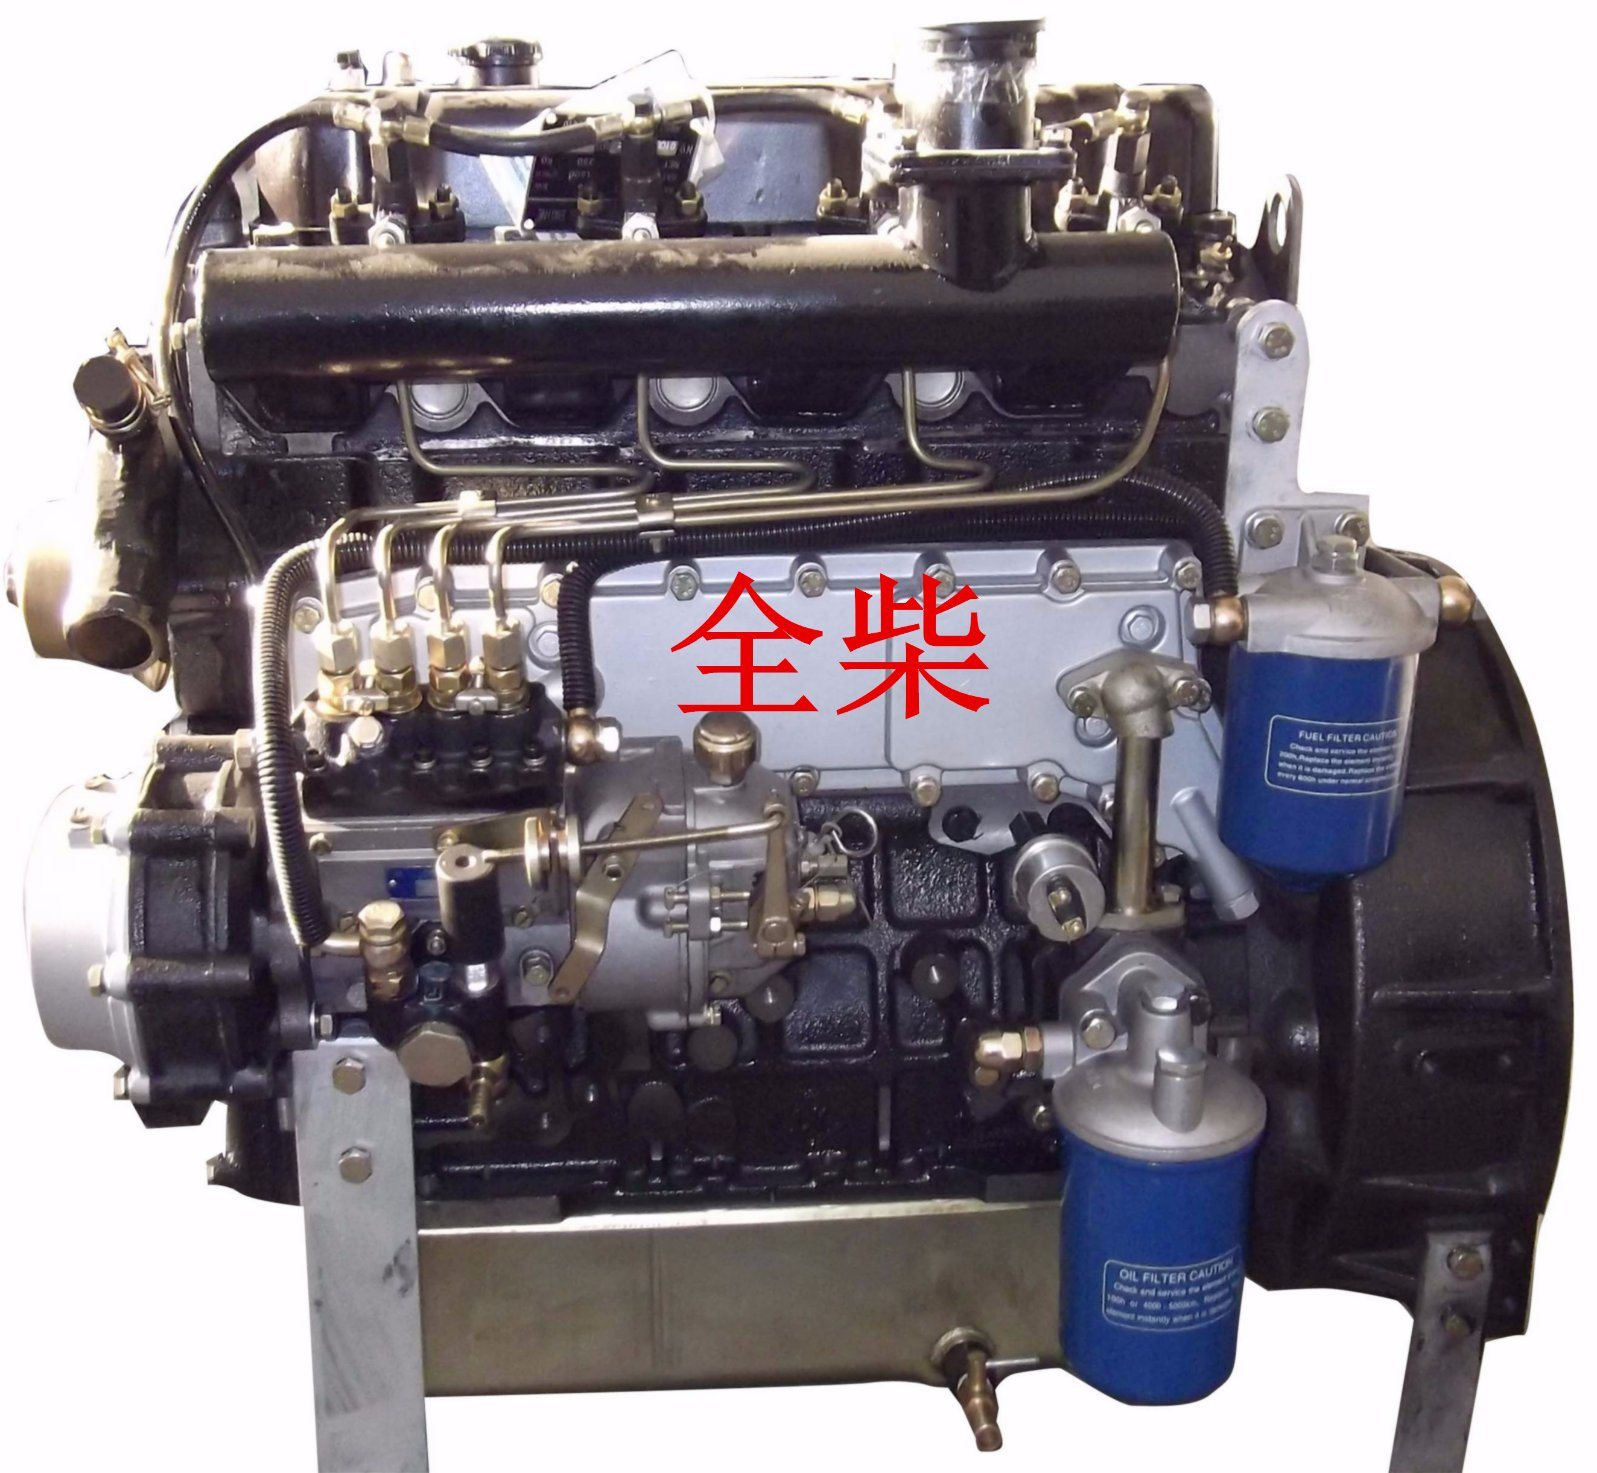 China Qc4102d Multi Cylinder Lister Petter Diesel Engines For Sale Engine Diagram